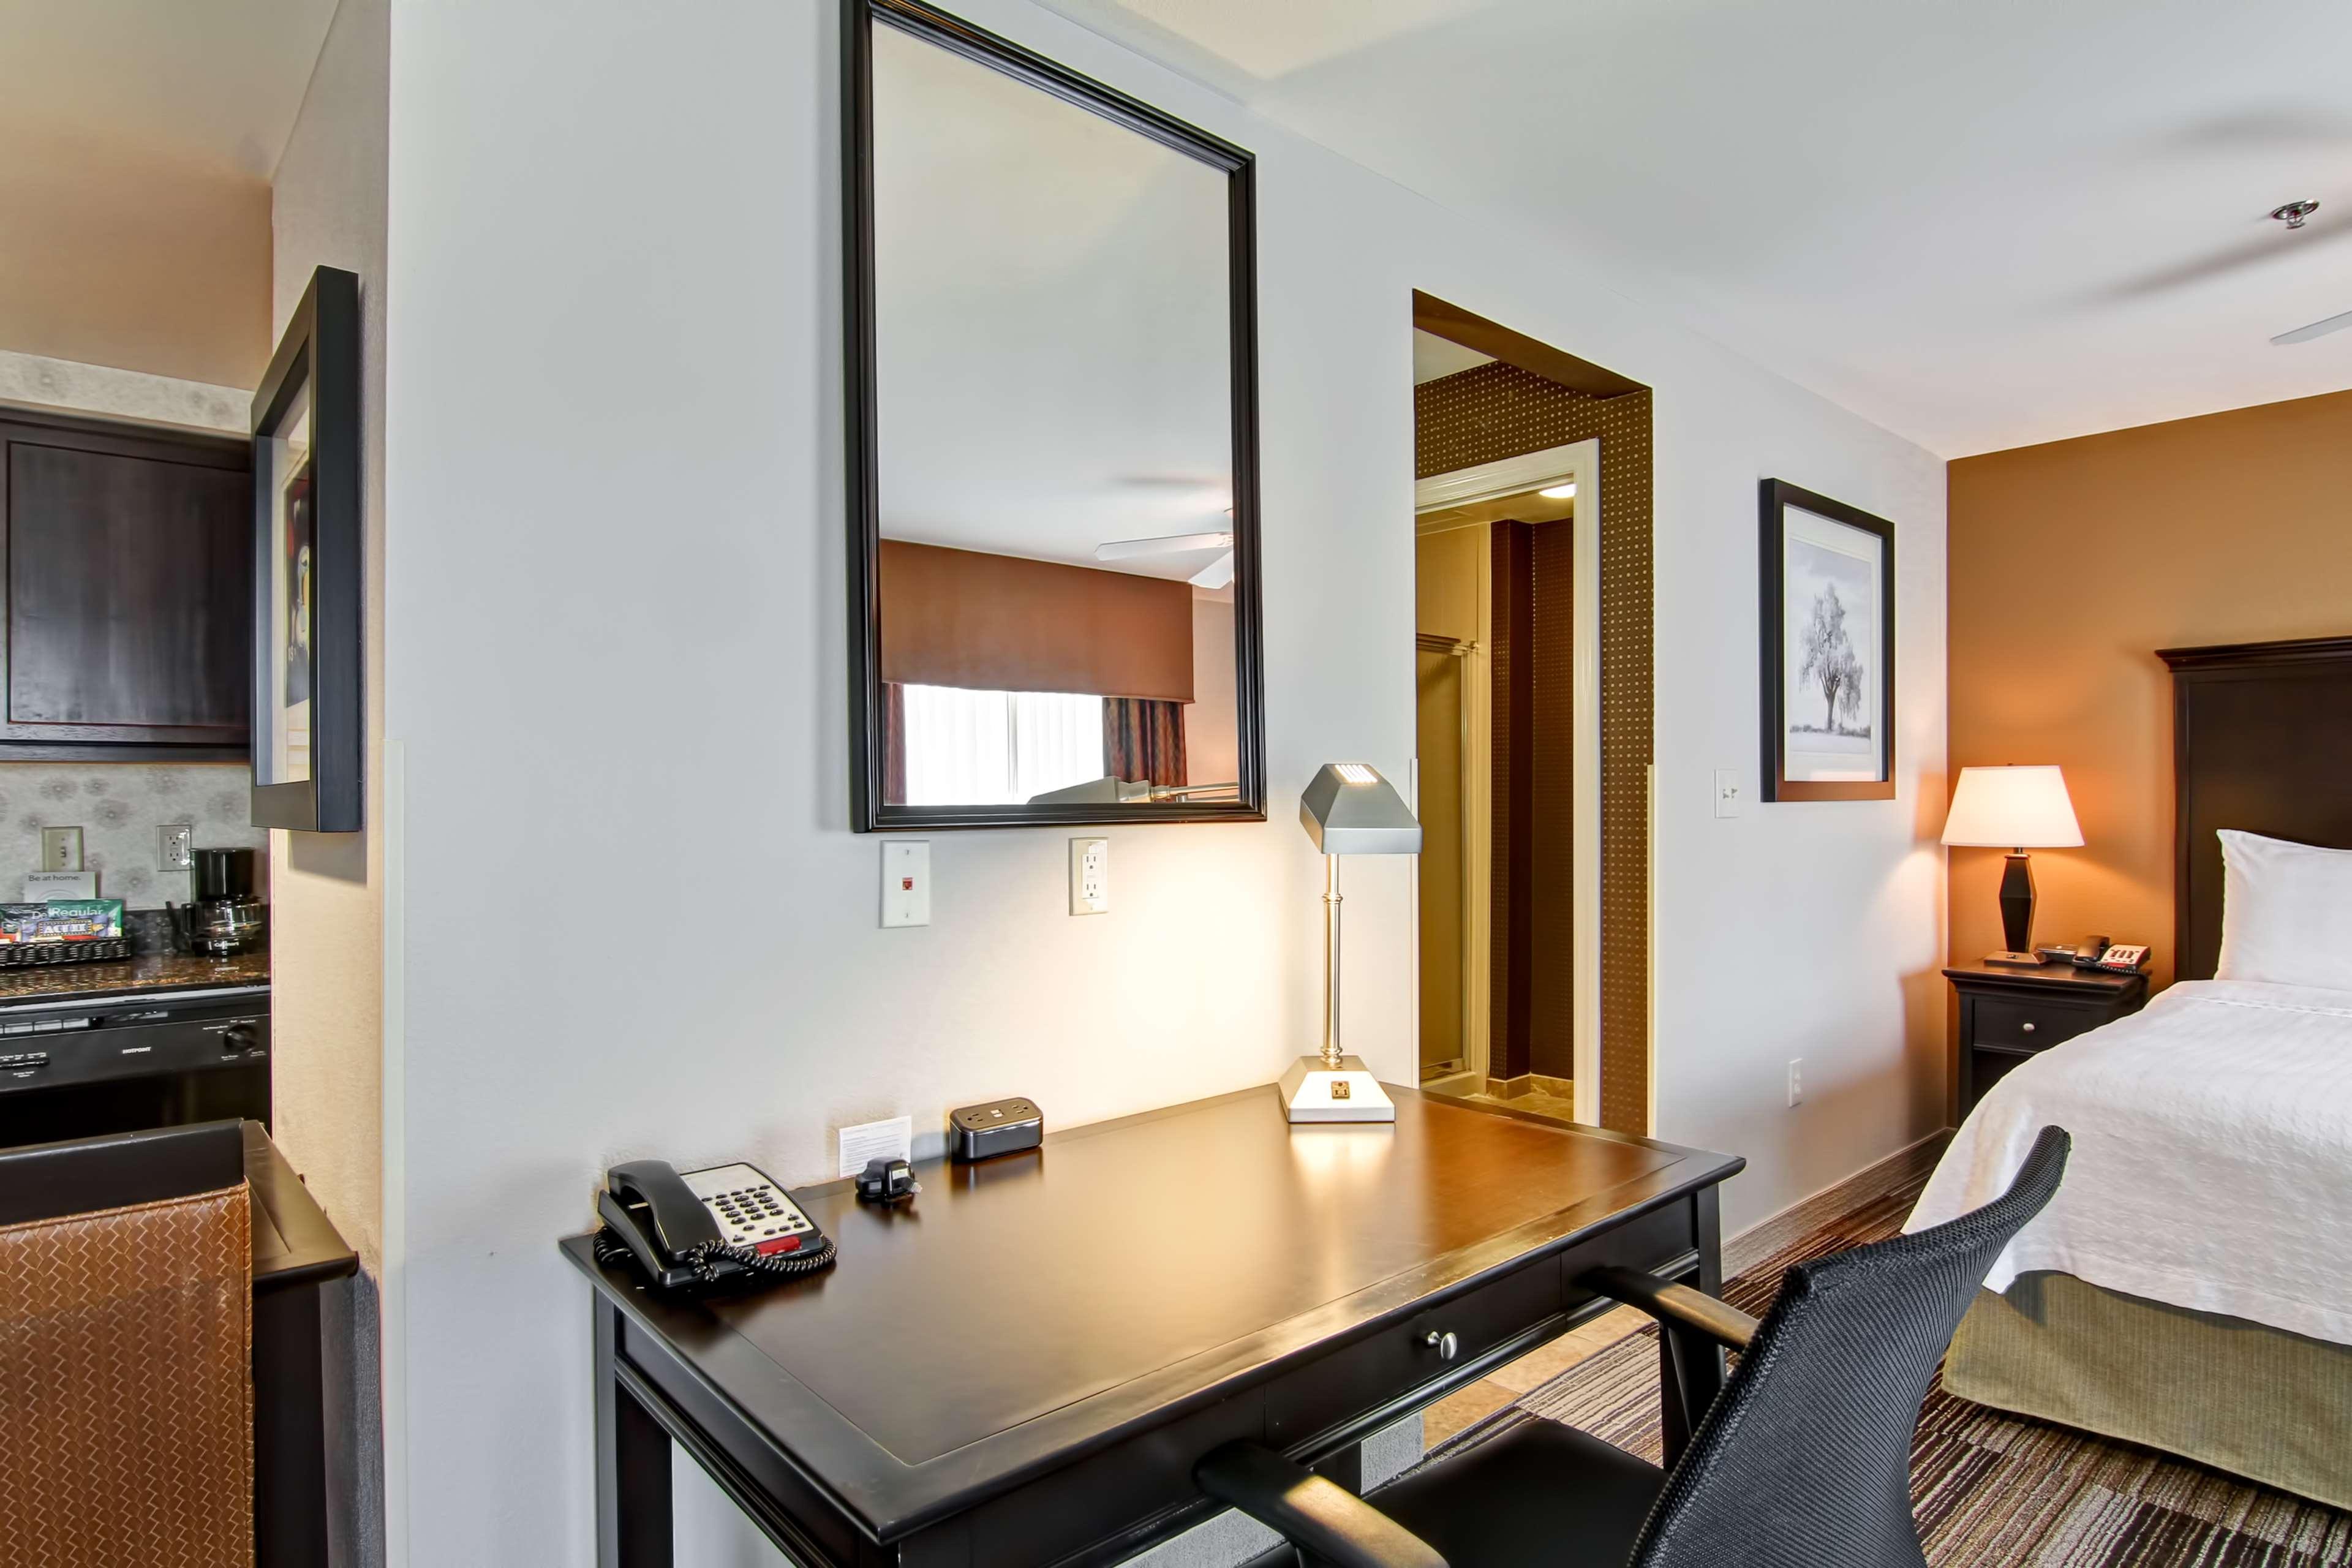 Homewood Suites by Hilton Cincinnati Airport South-Florence image 30